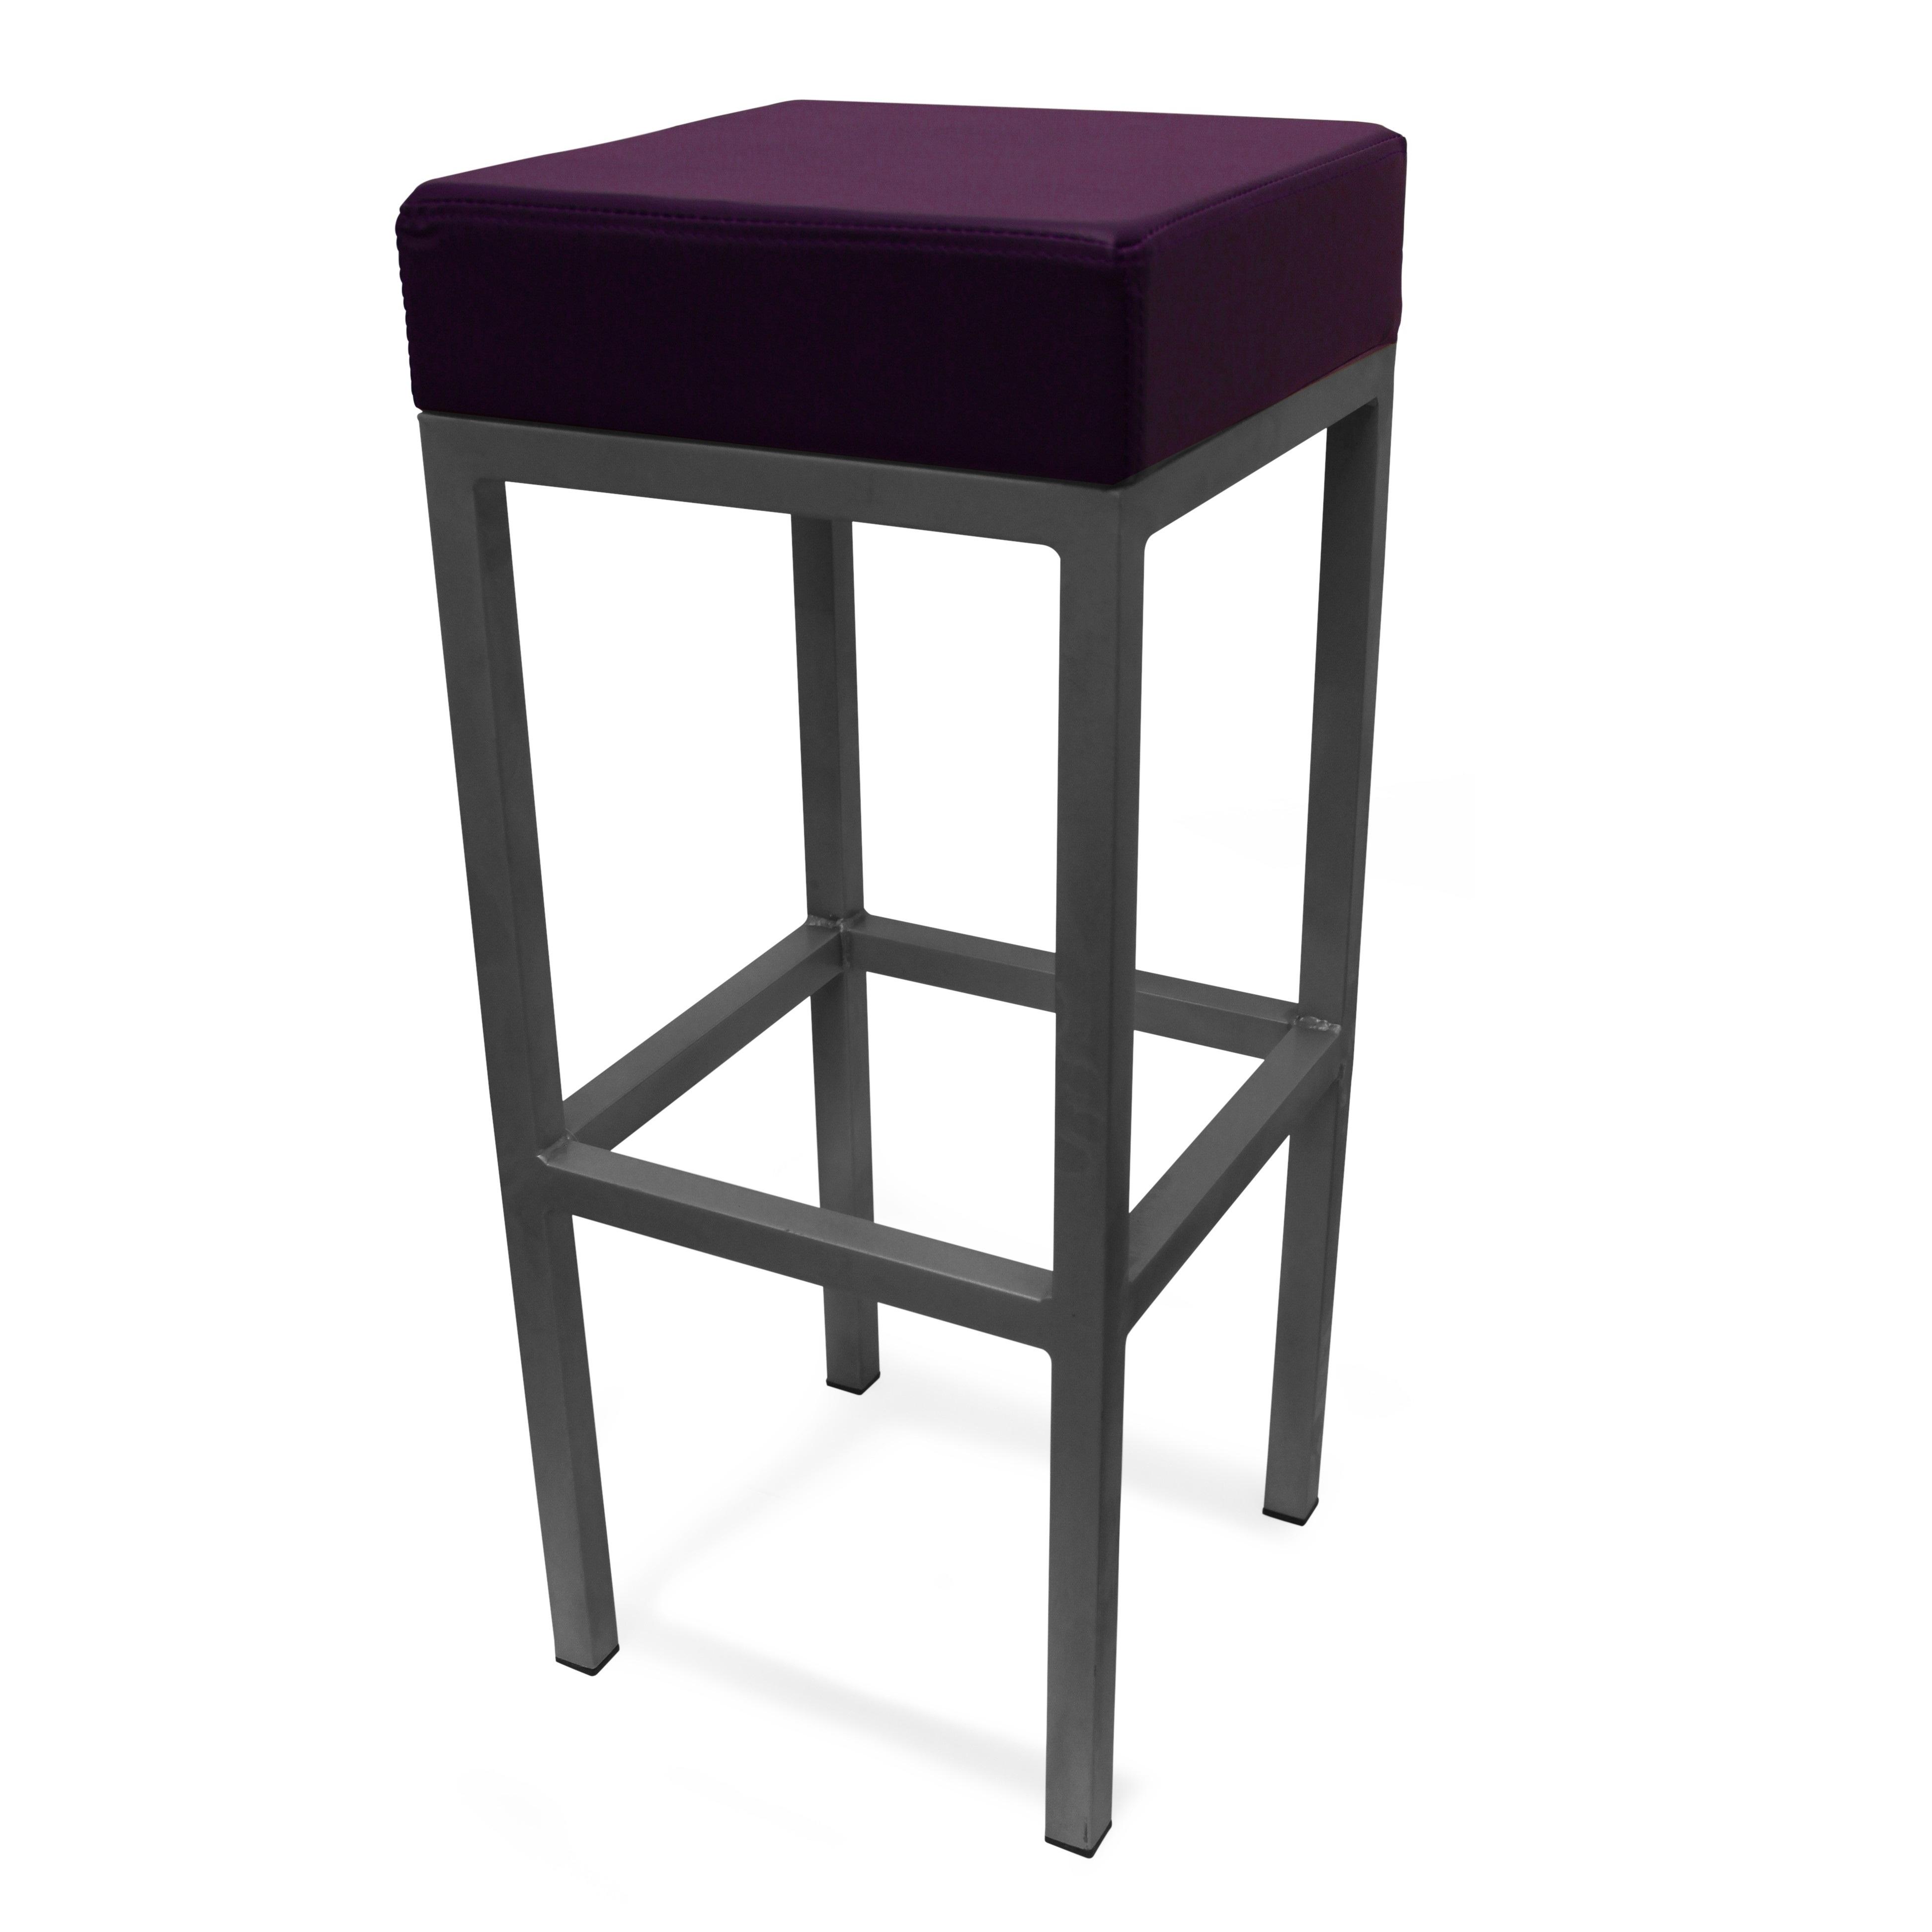 Cube bar stool purple